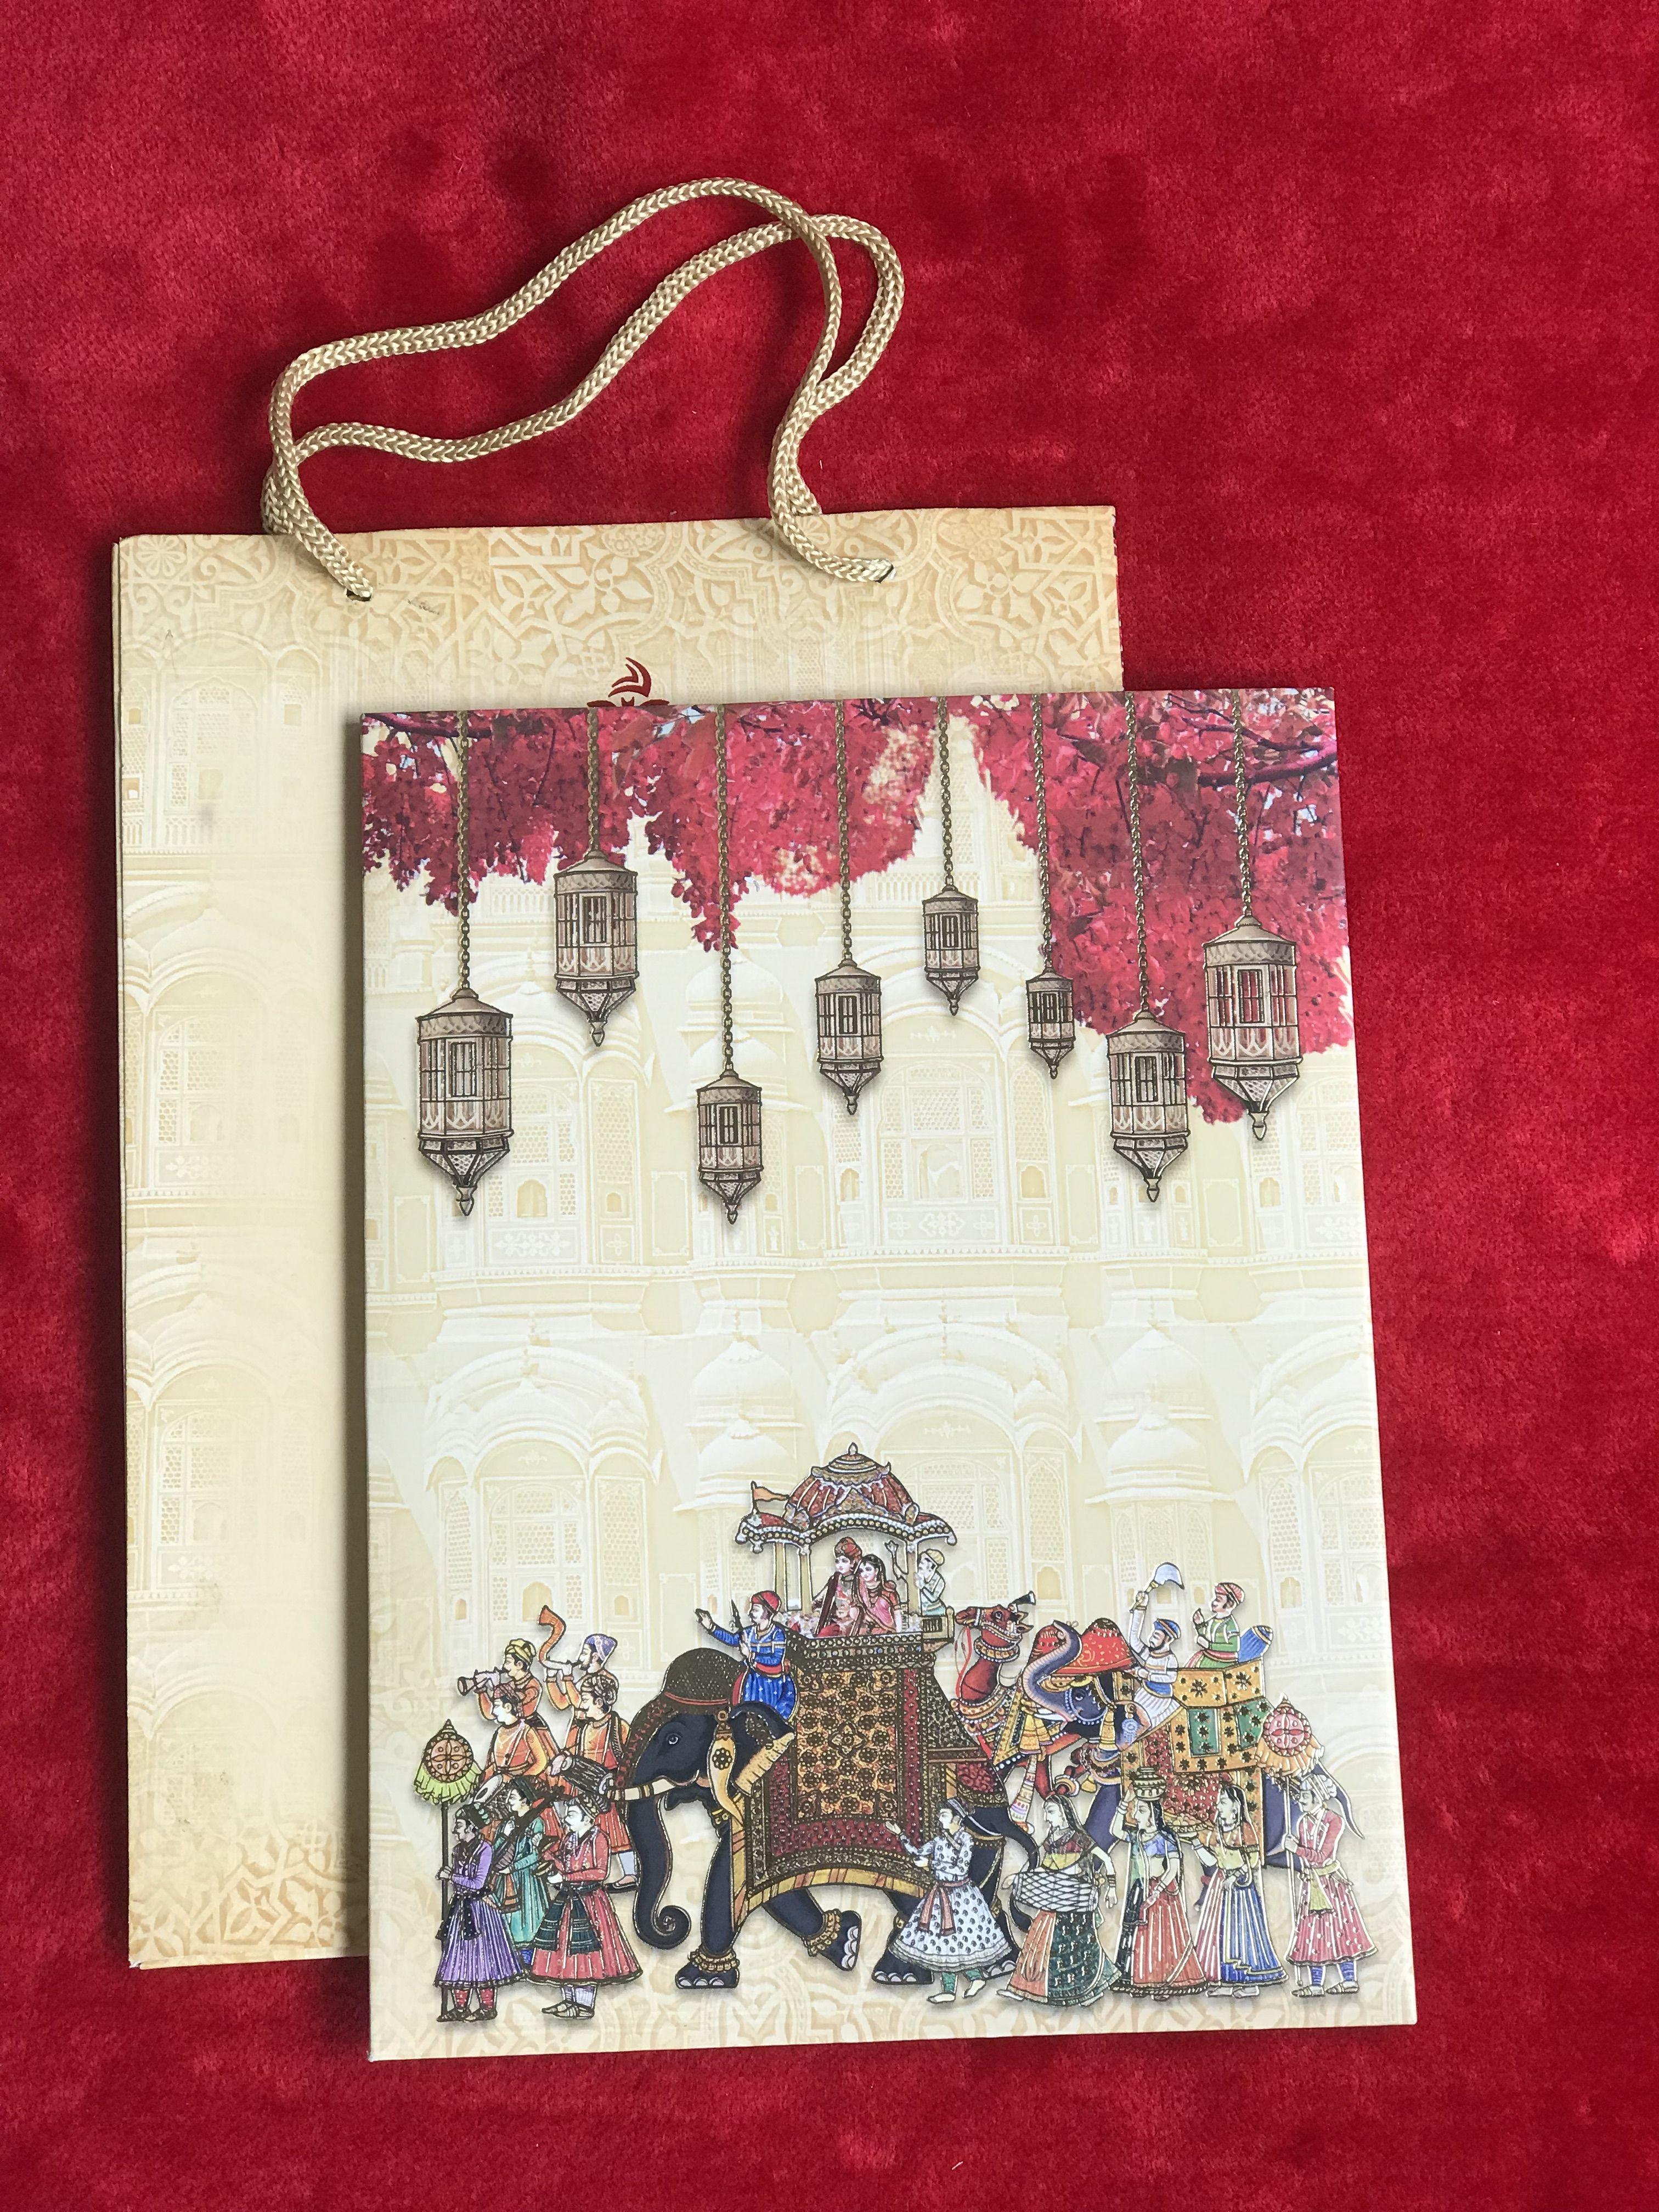 500+ Best Jiban Sangram images in 2020 | wedding cards, wedding  invitations, indian wedding cards